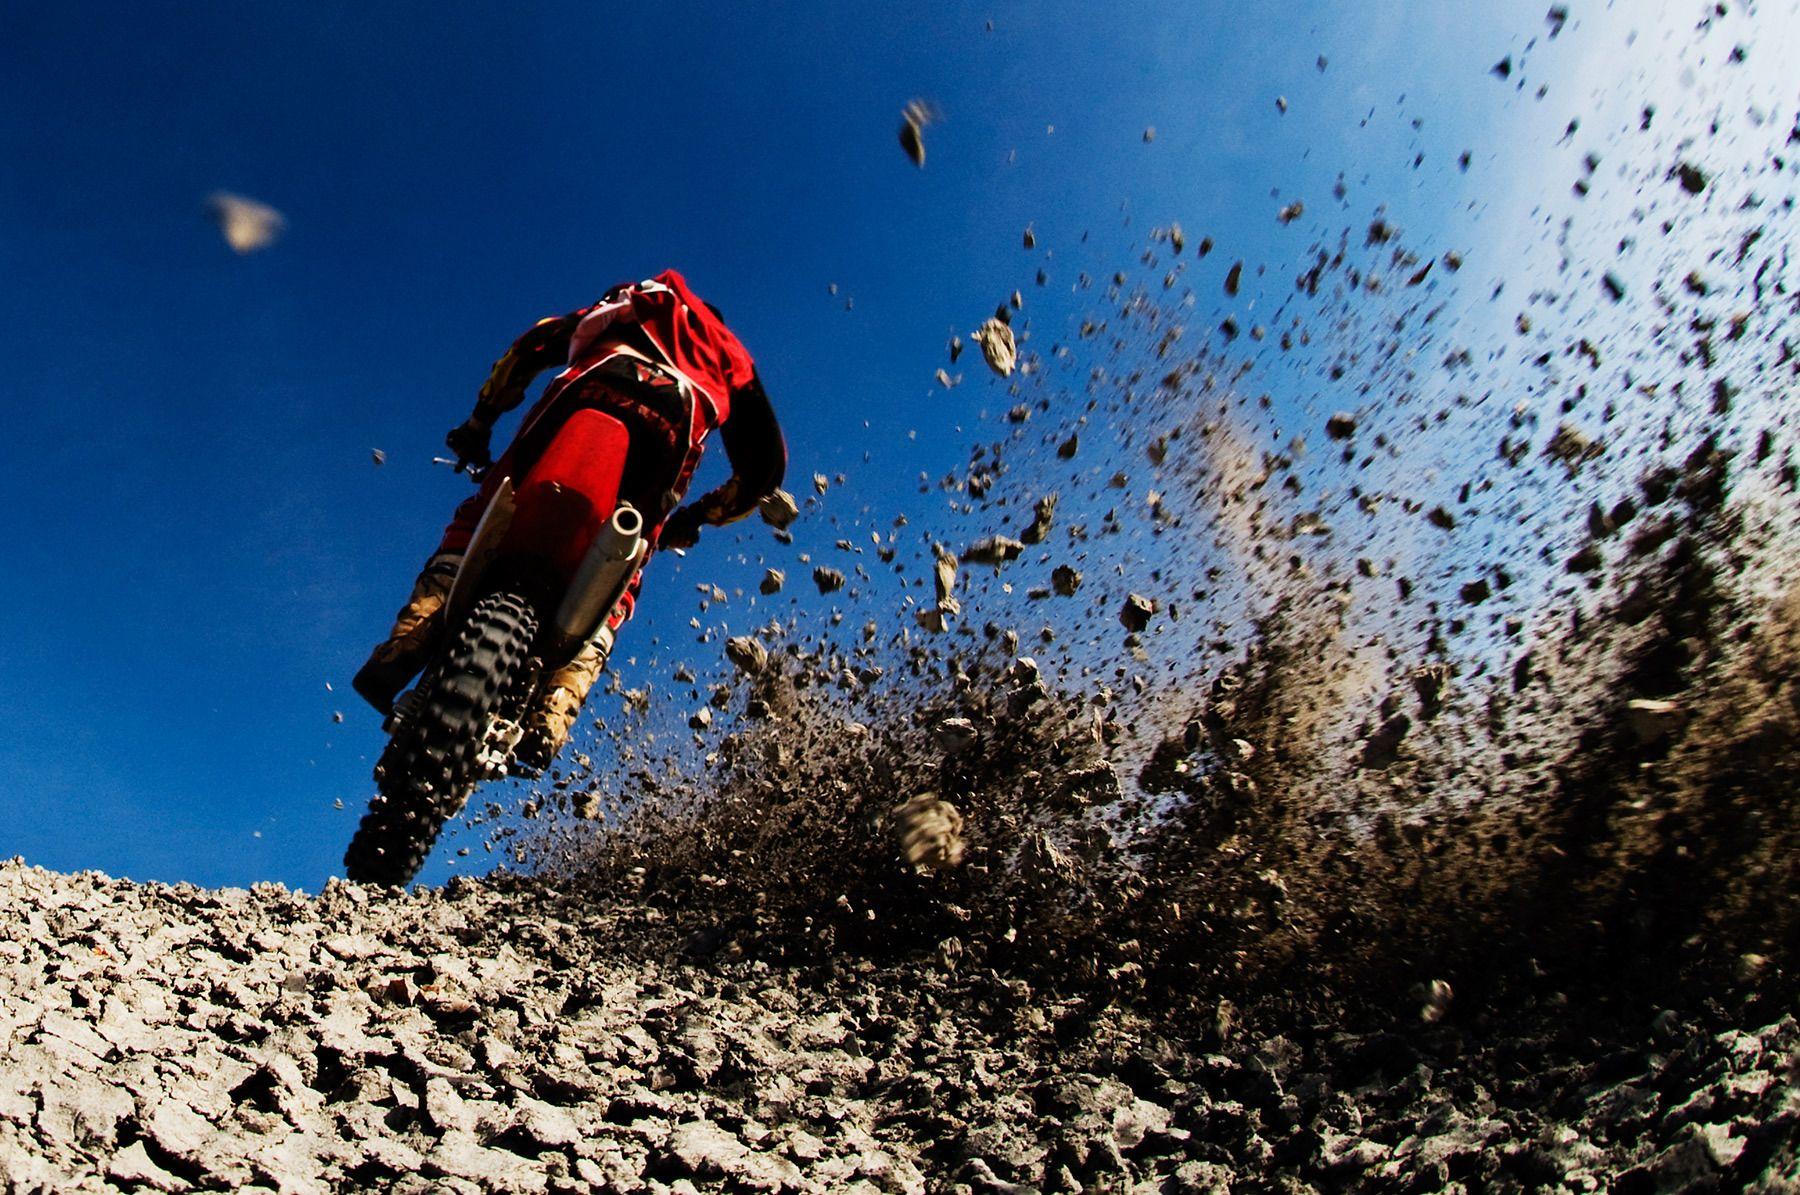 Motocross rider Northern Arizona